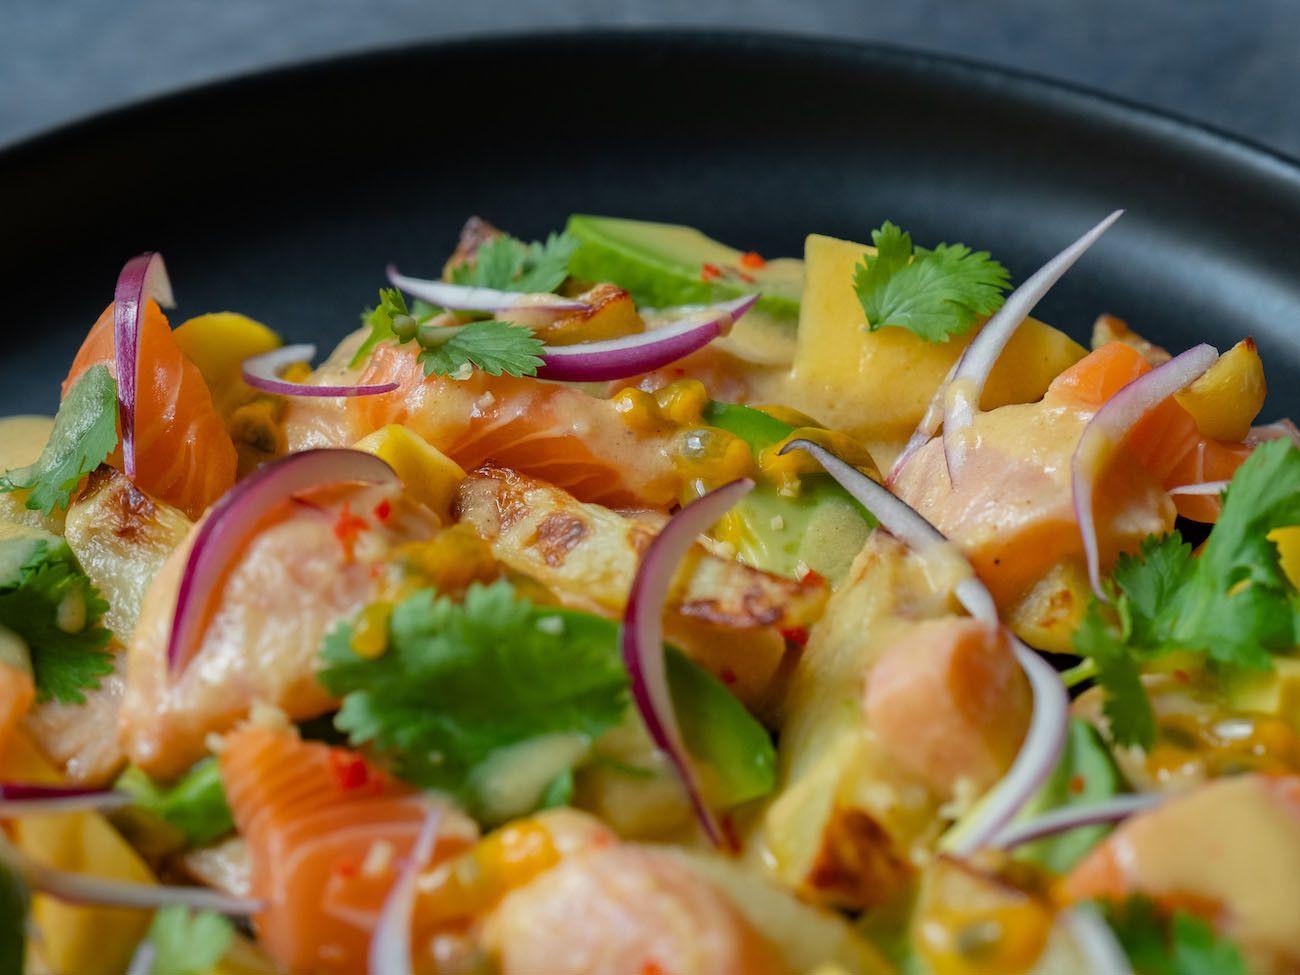 Foodblog, About Fuel, CEVICHE Das Kochbuch, Juan Danilo, Kartoffeln, Mango, Lachs